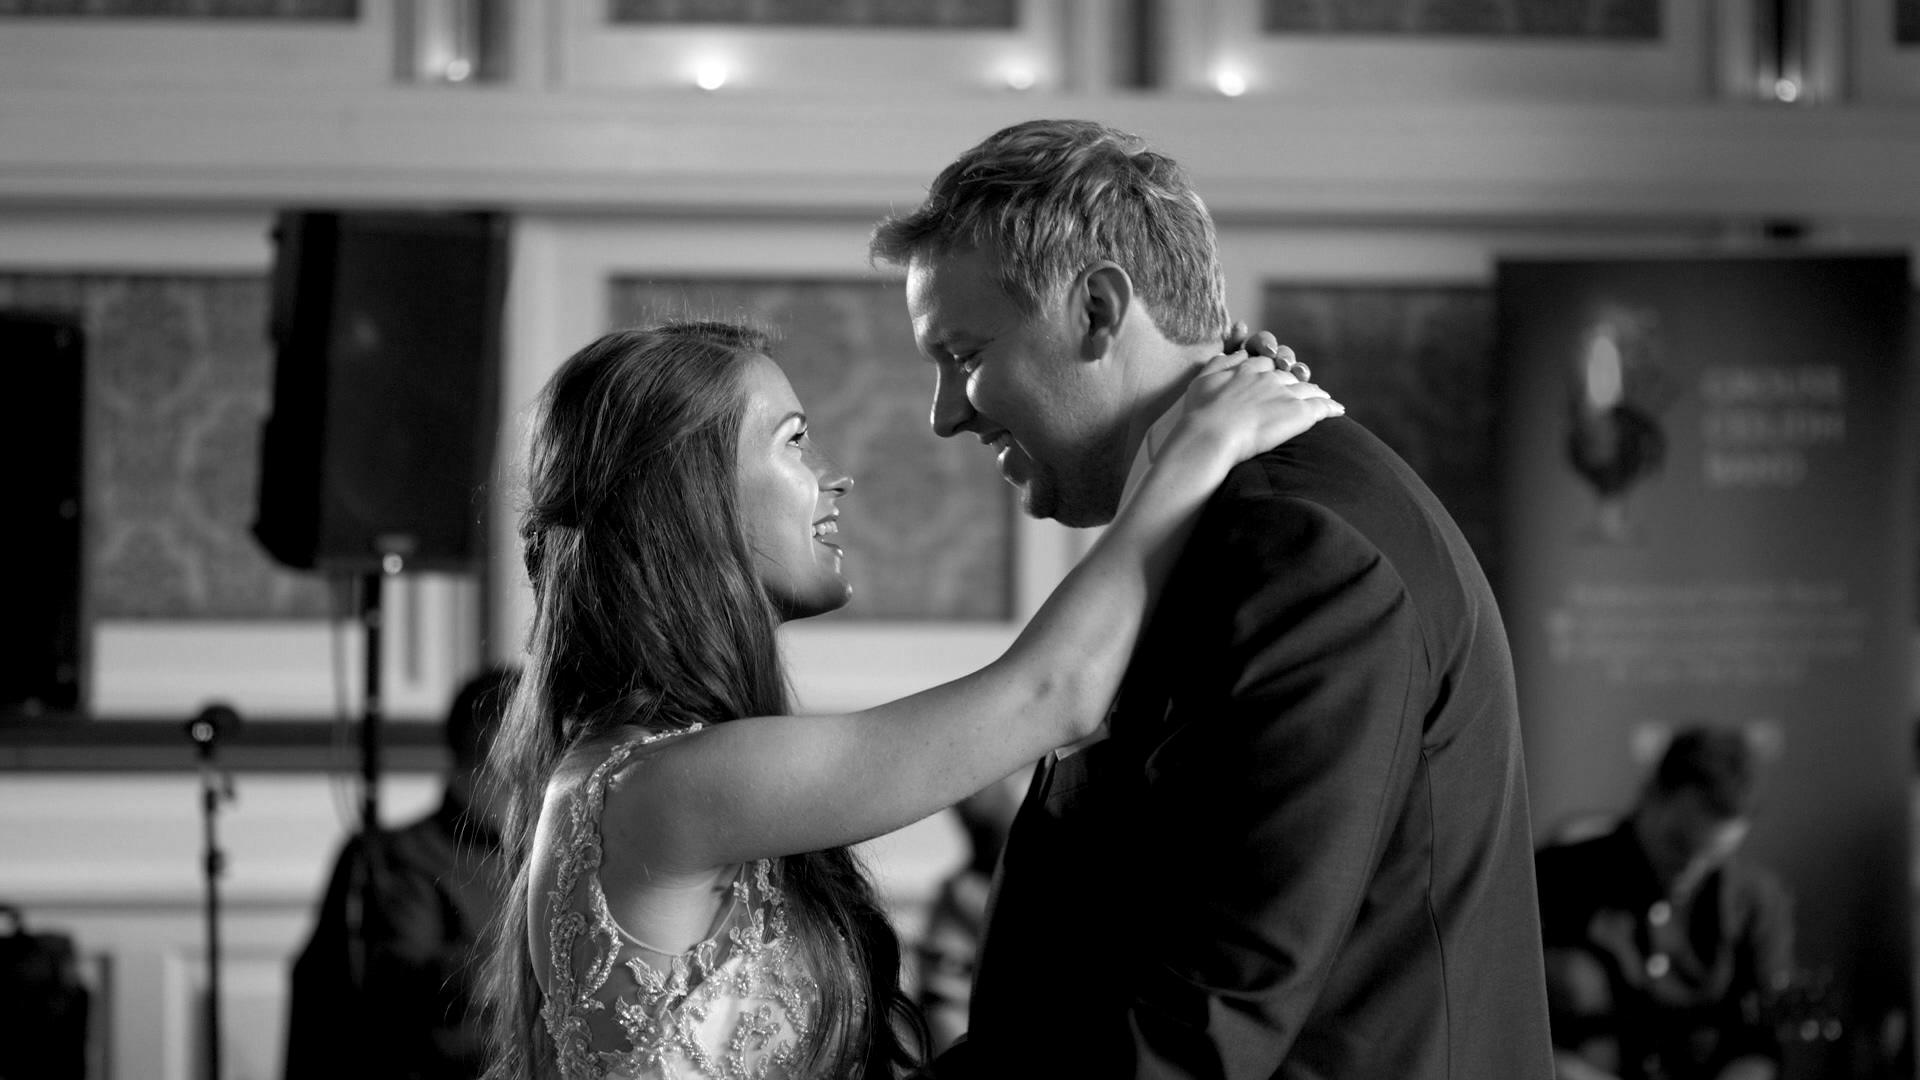 DRUMTOCHTY-SUMMER-WEDDING (25).jpg